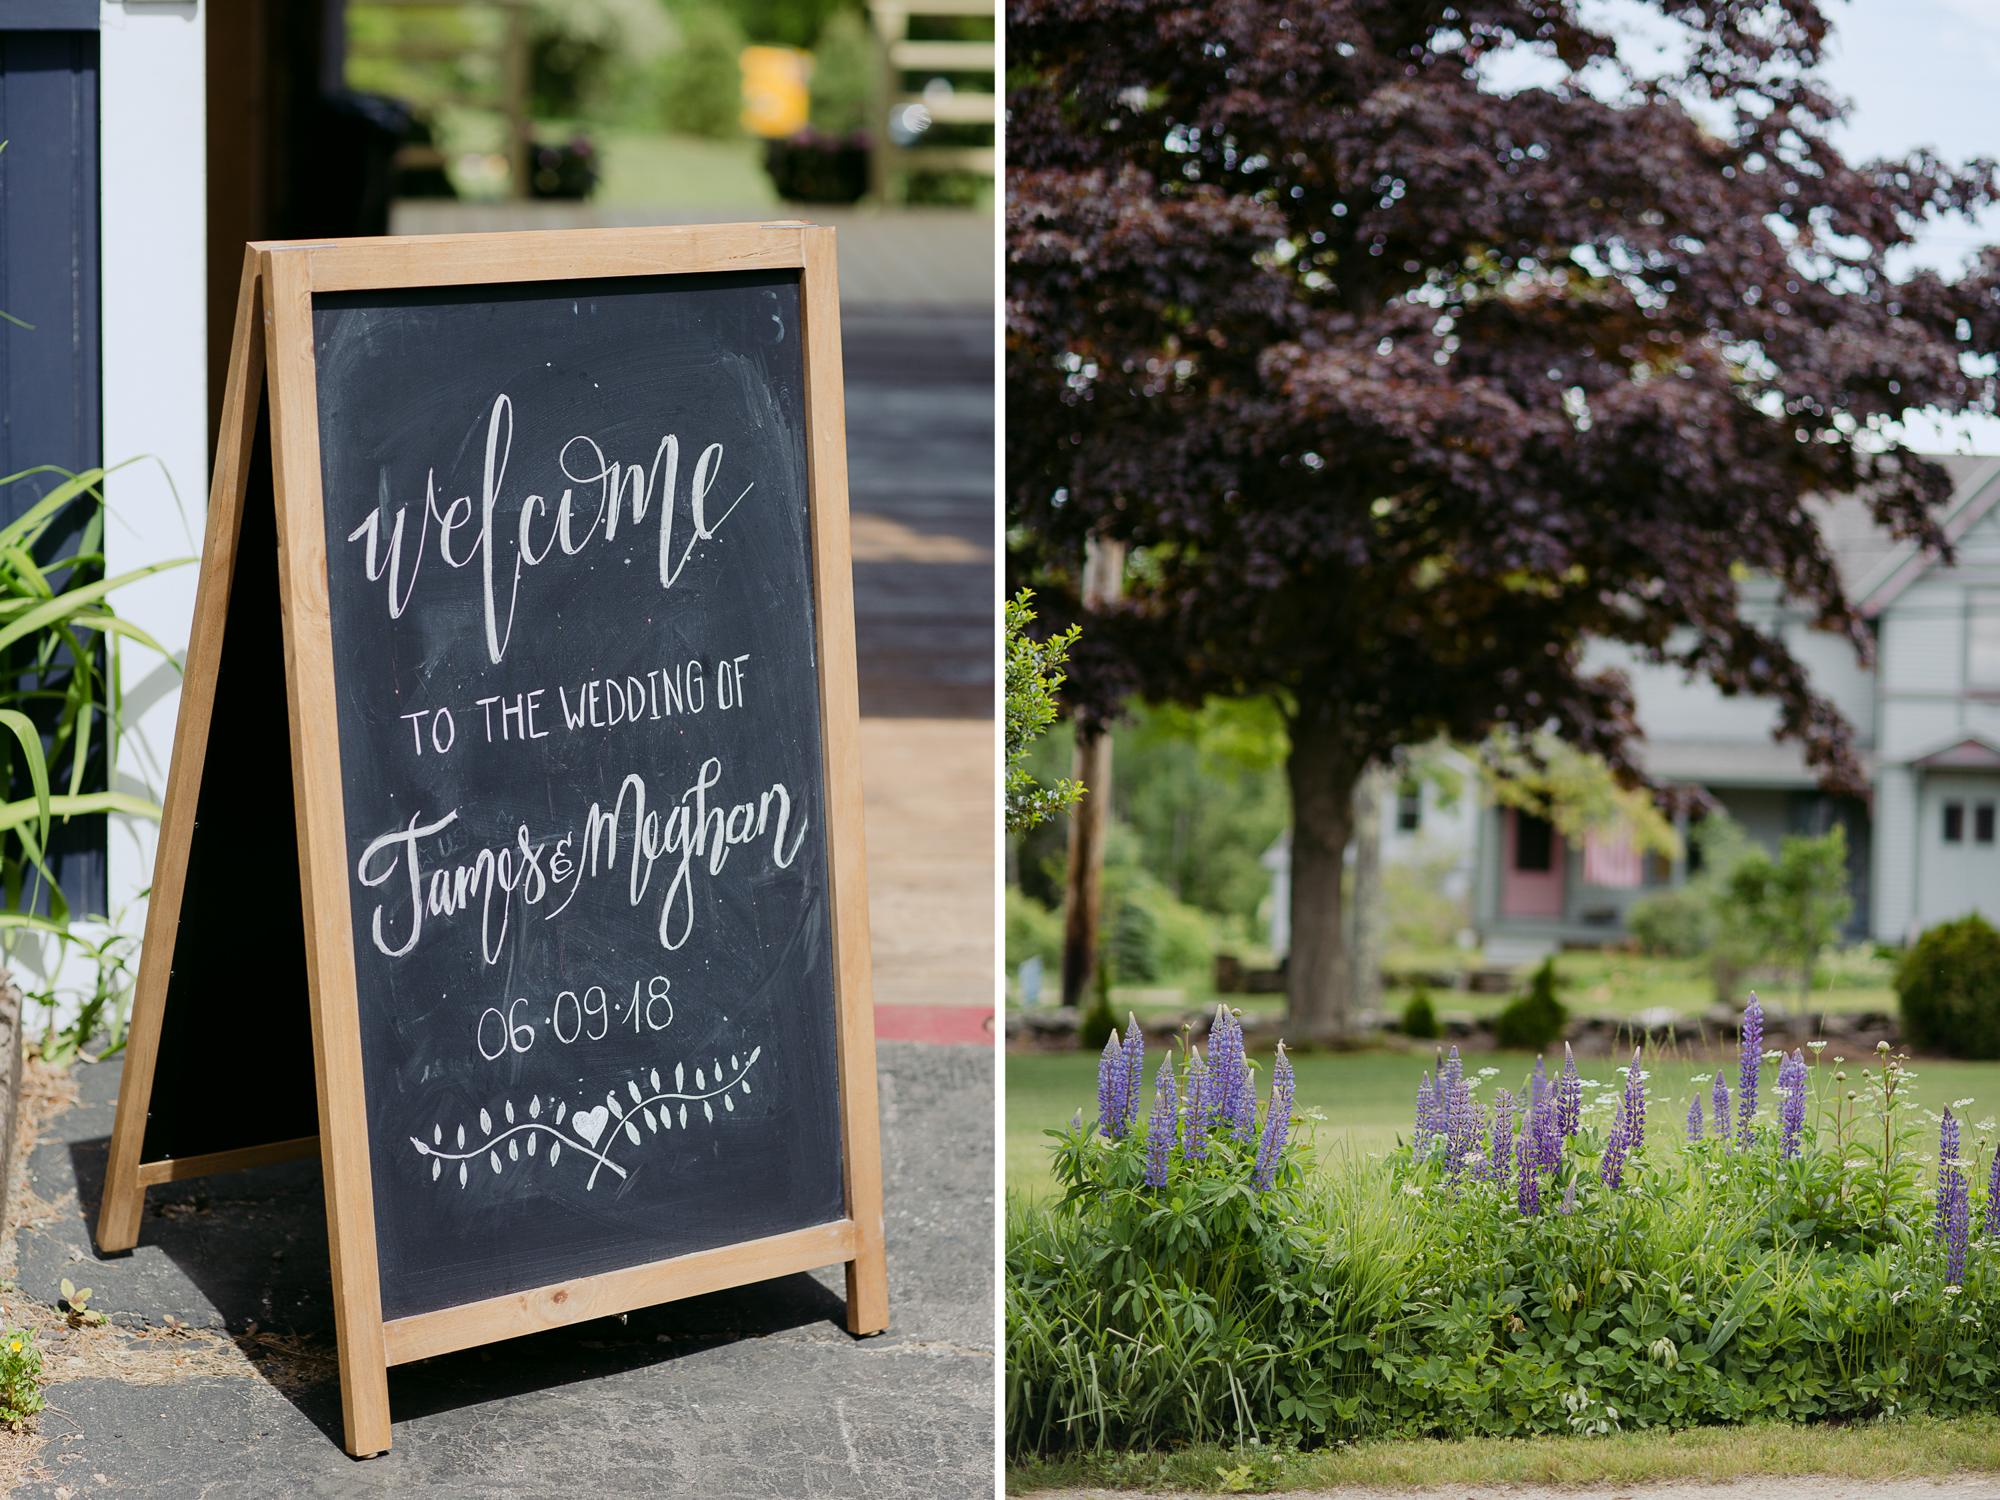 Livewell_Farm_wedding_Harpswell_maine_Meghan_Jim_006.jpg